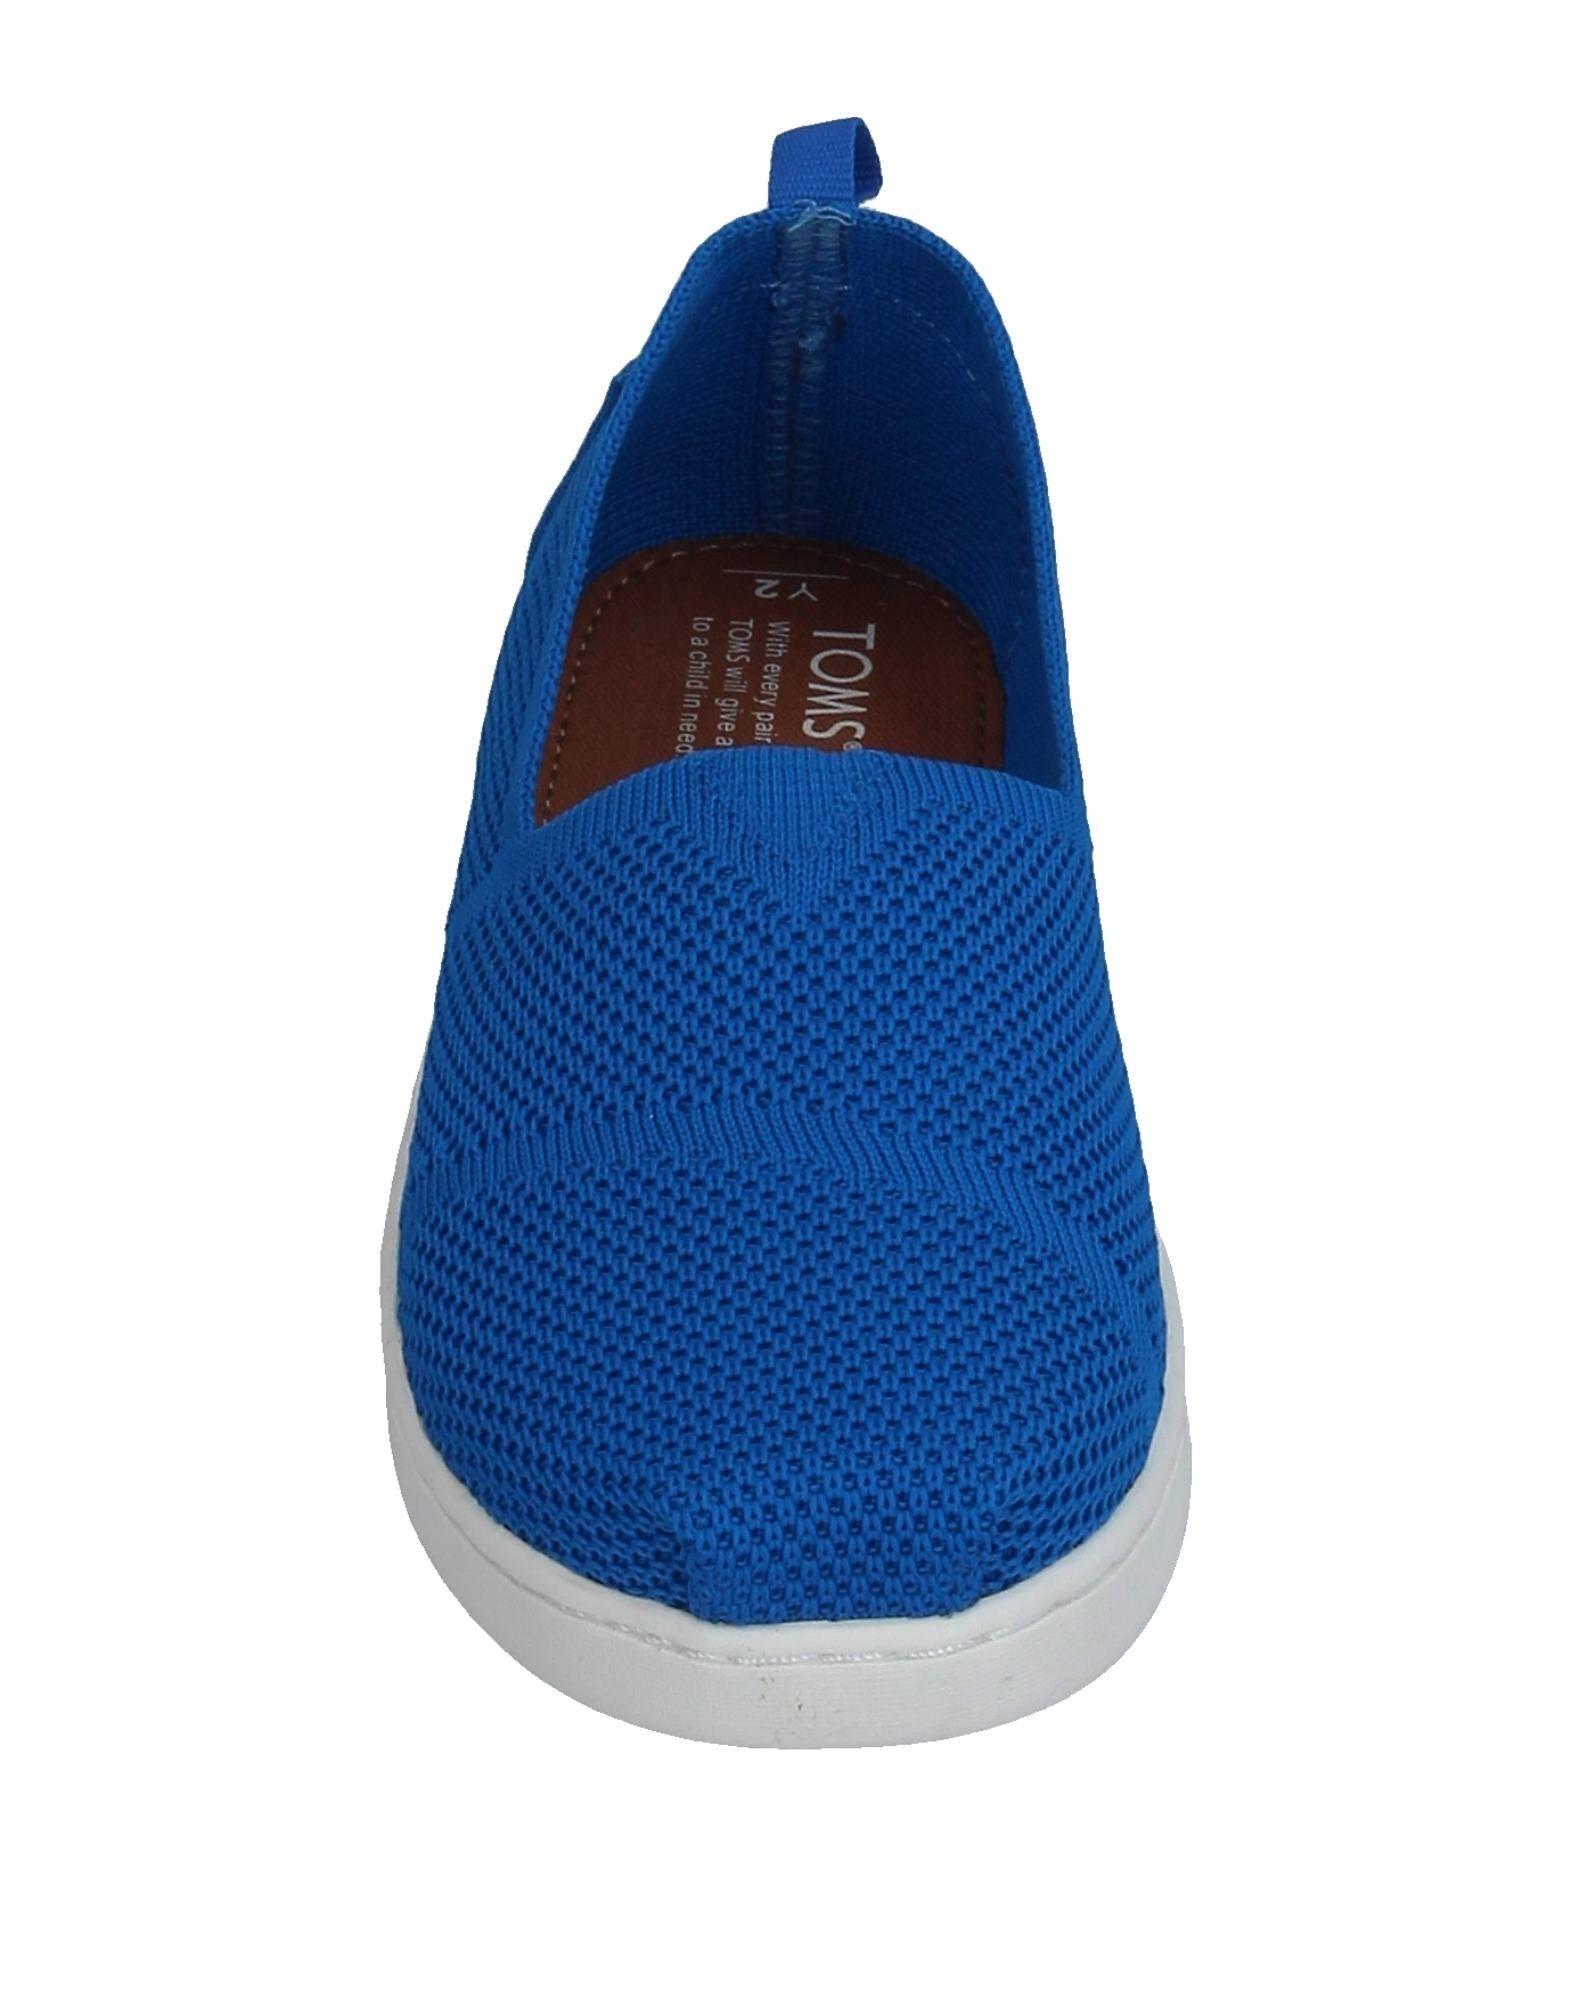 378e30f4d3e1 TOMS ΠΑΠΟΥΤΣΙΑ Παπούτσια τένις χαμηλά